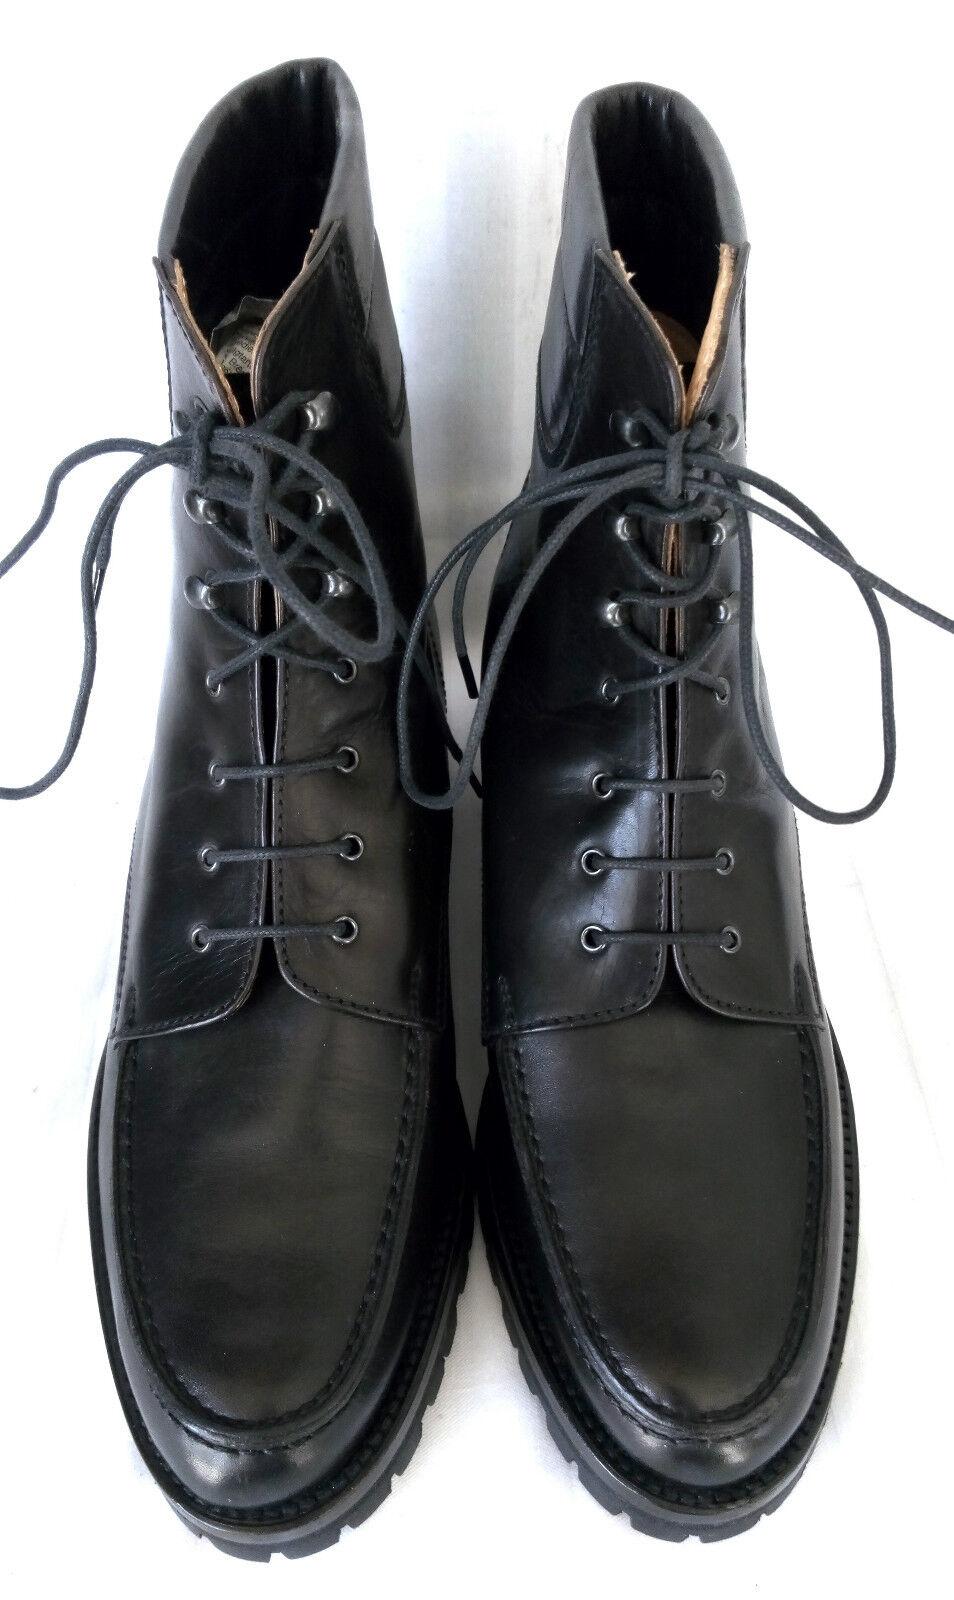 Grand Step señora señora señora botas botines negro teñido trapecios talla 38 como nuevo f2a932